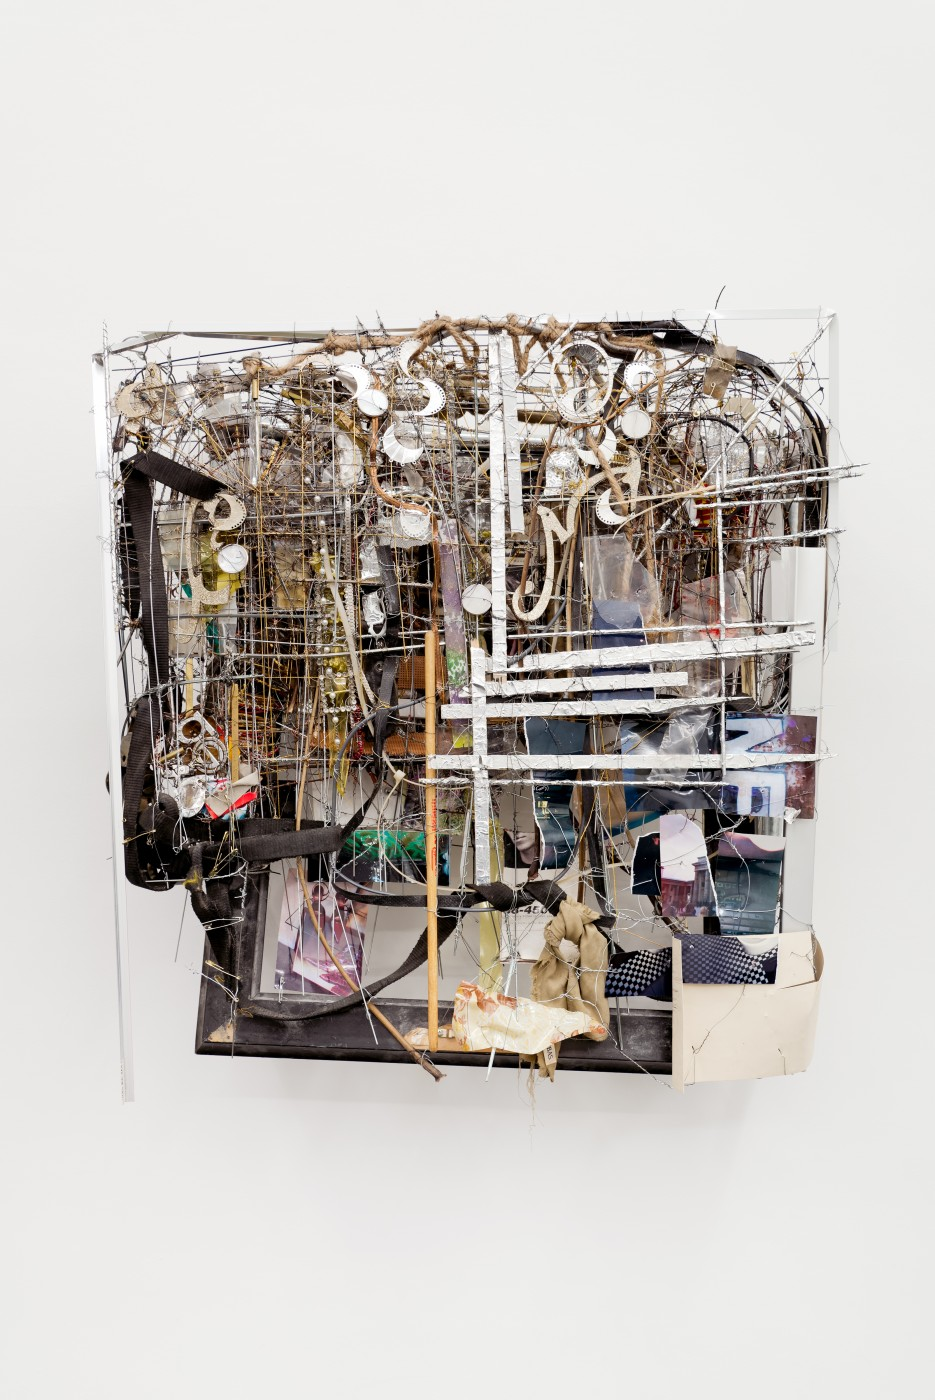 METROPOLITAN  Passion Avenue</I>, 2015 Mixed media 80 x 67 x 22 cm / 31.5 x 26.3 x 8.6 in  ROBERT BITTENBENDER